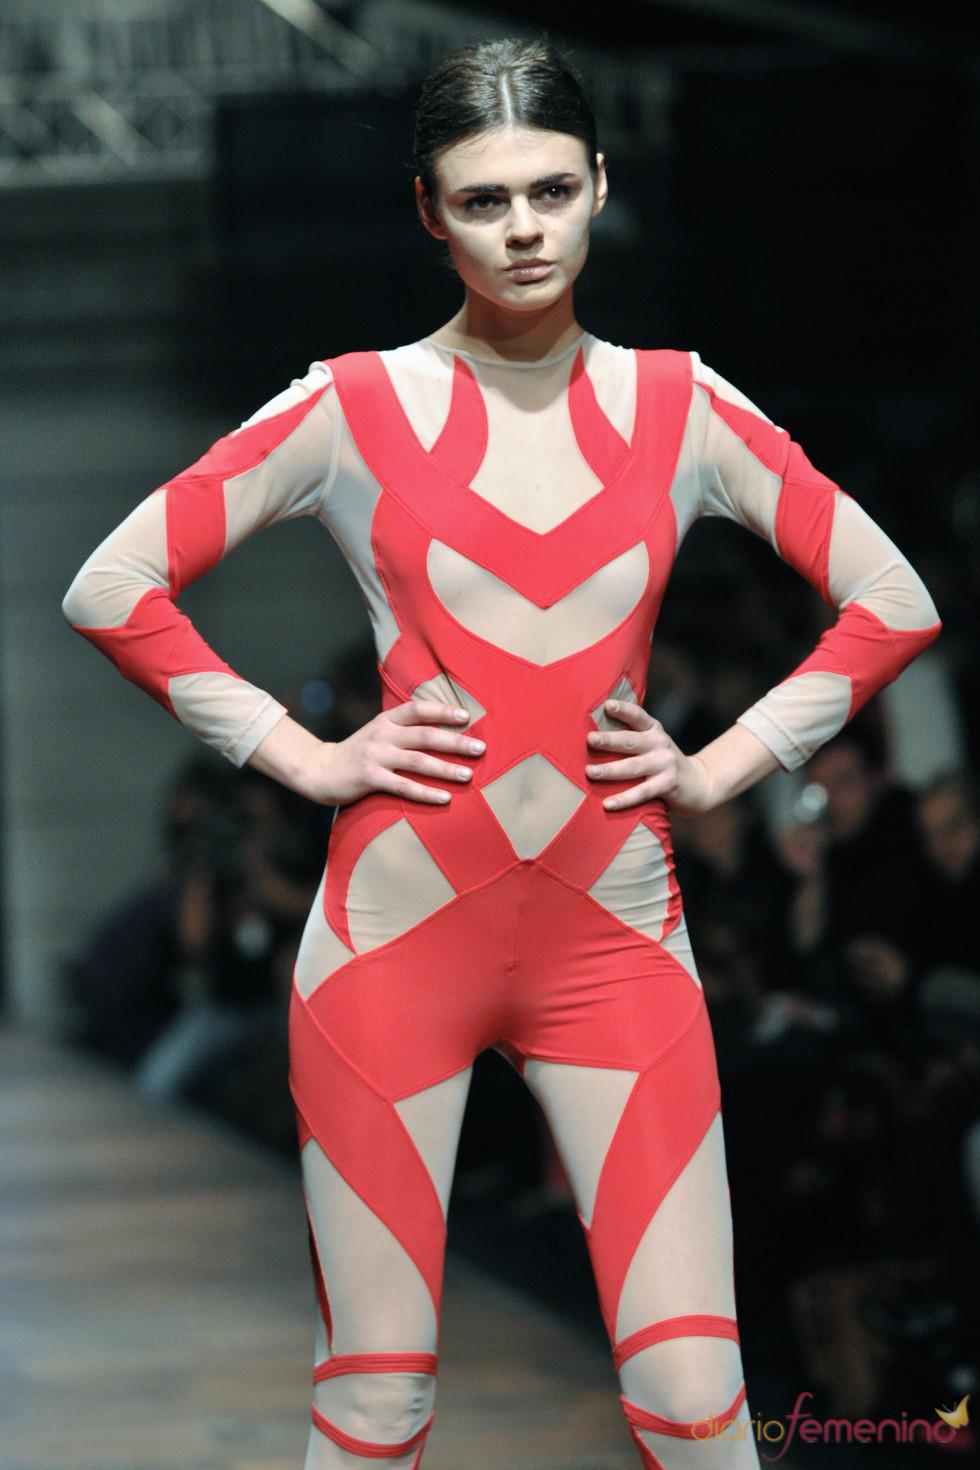 Agnieszka Maciejak en la Poland Fashion Week